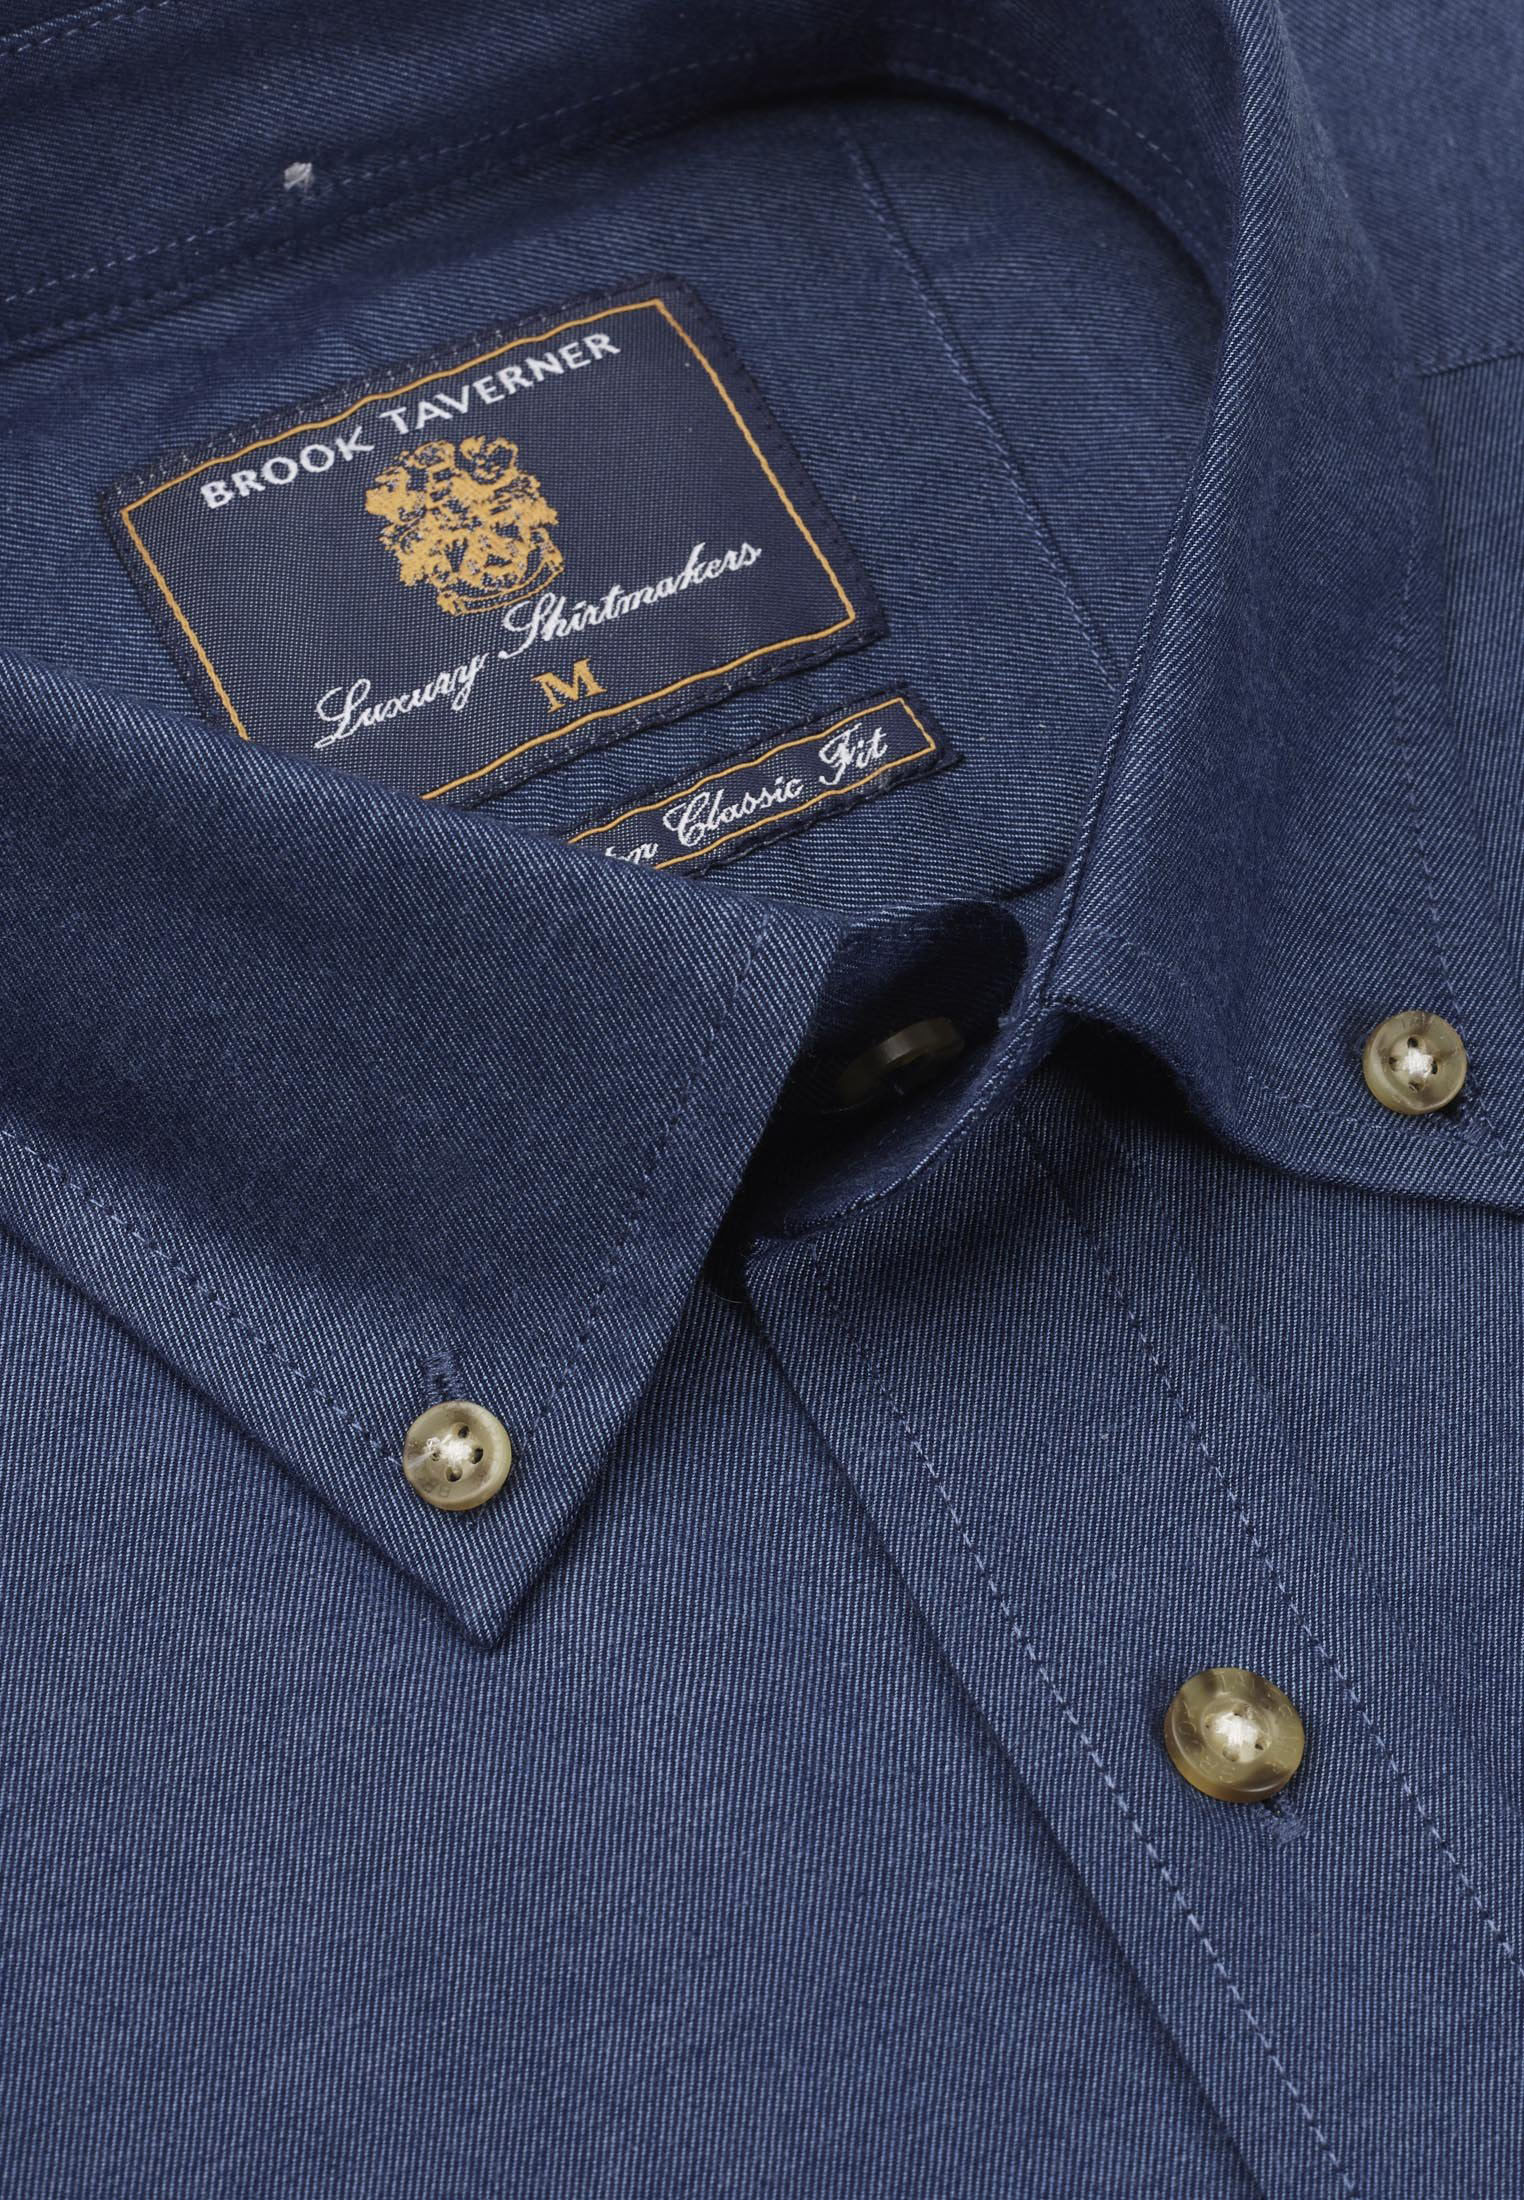 Plain Navy Twill Peached Cotton Button Down Collar Shirt